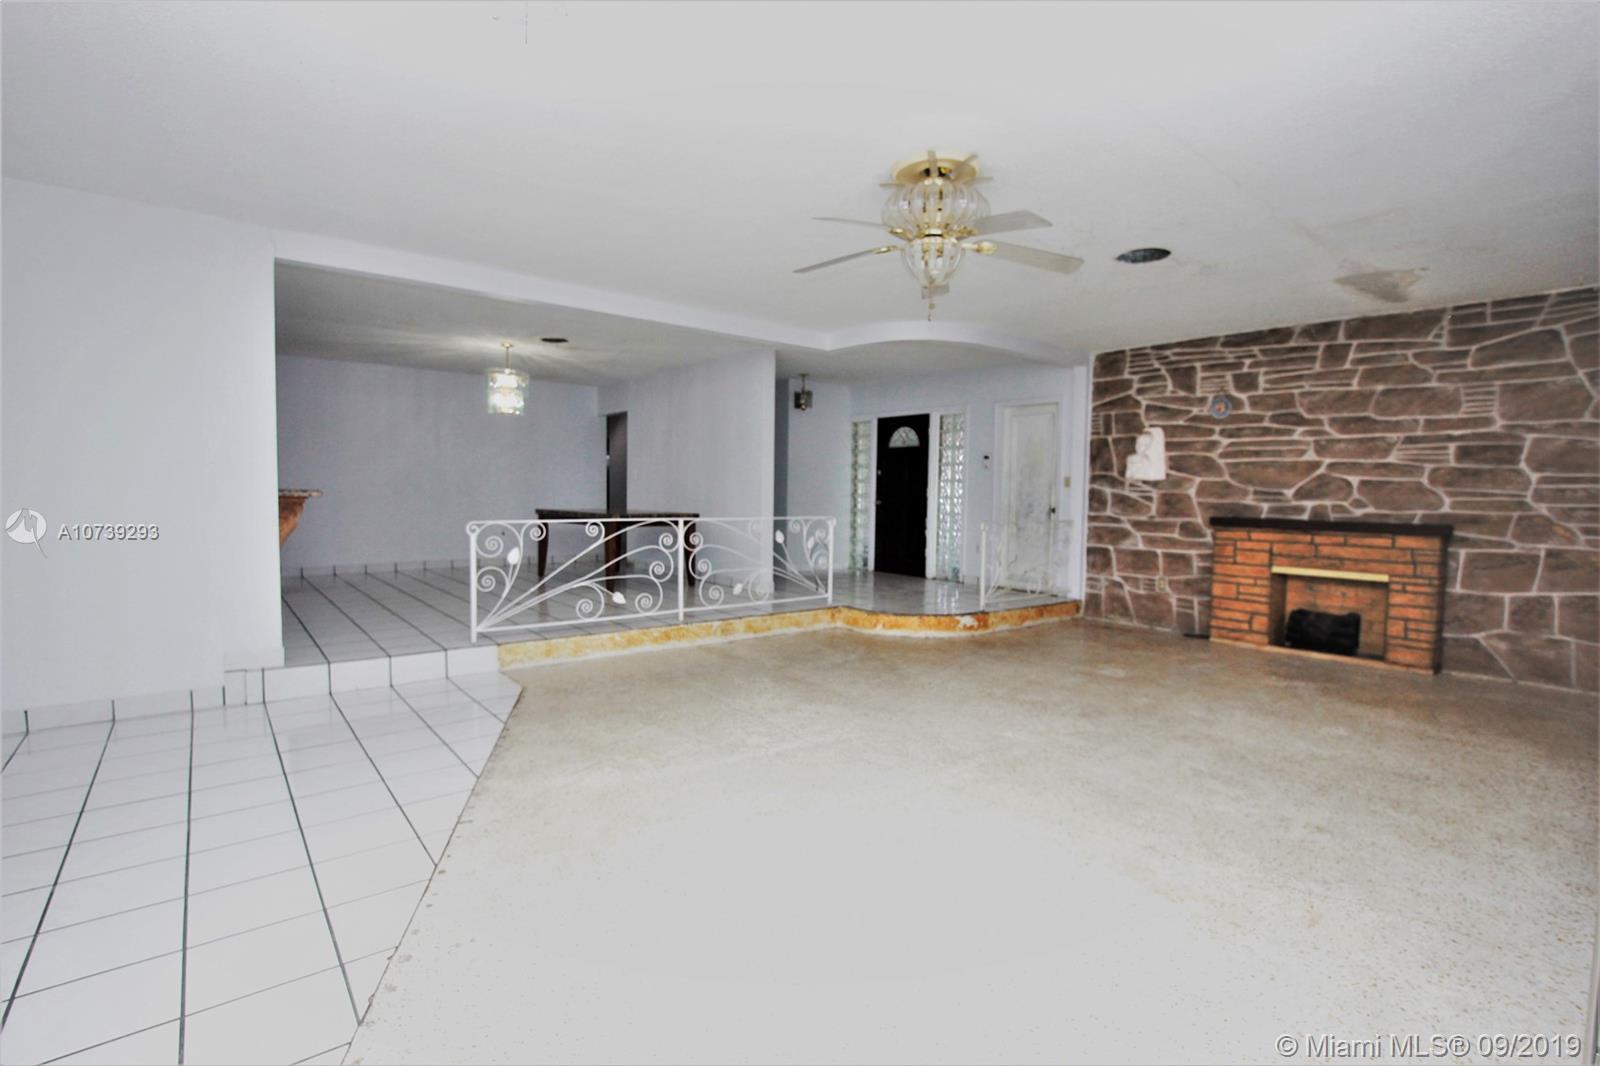 Greyknoll Estates # - 04 - photo